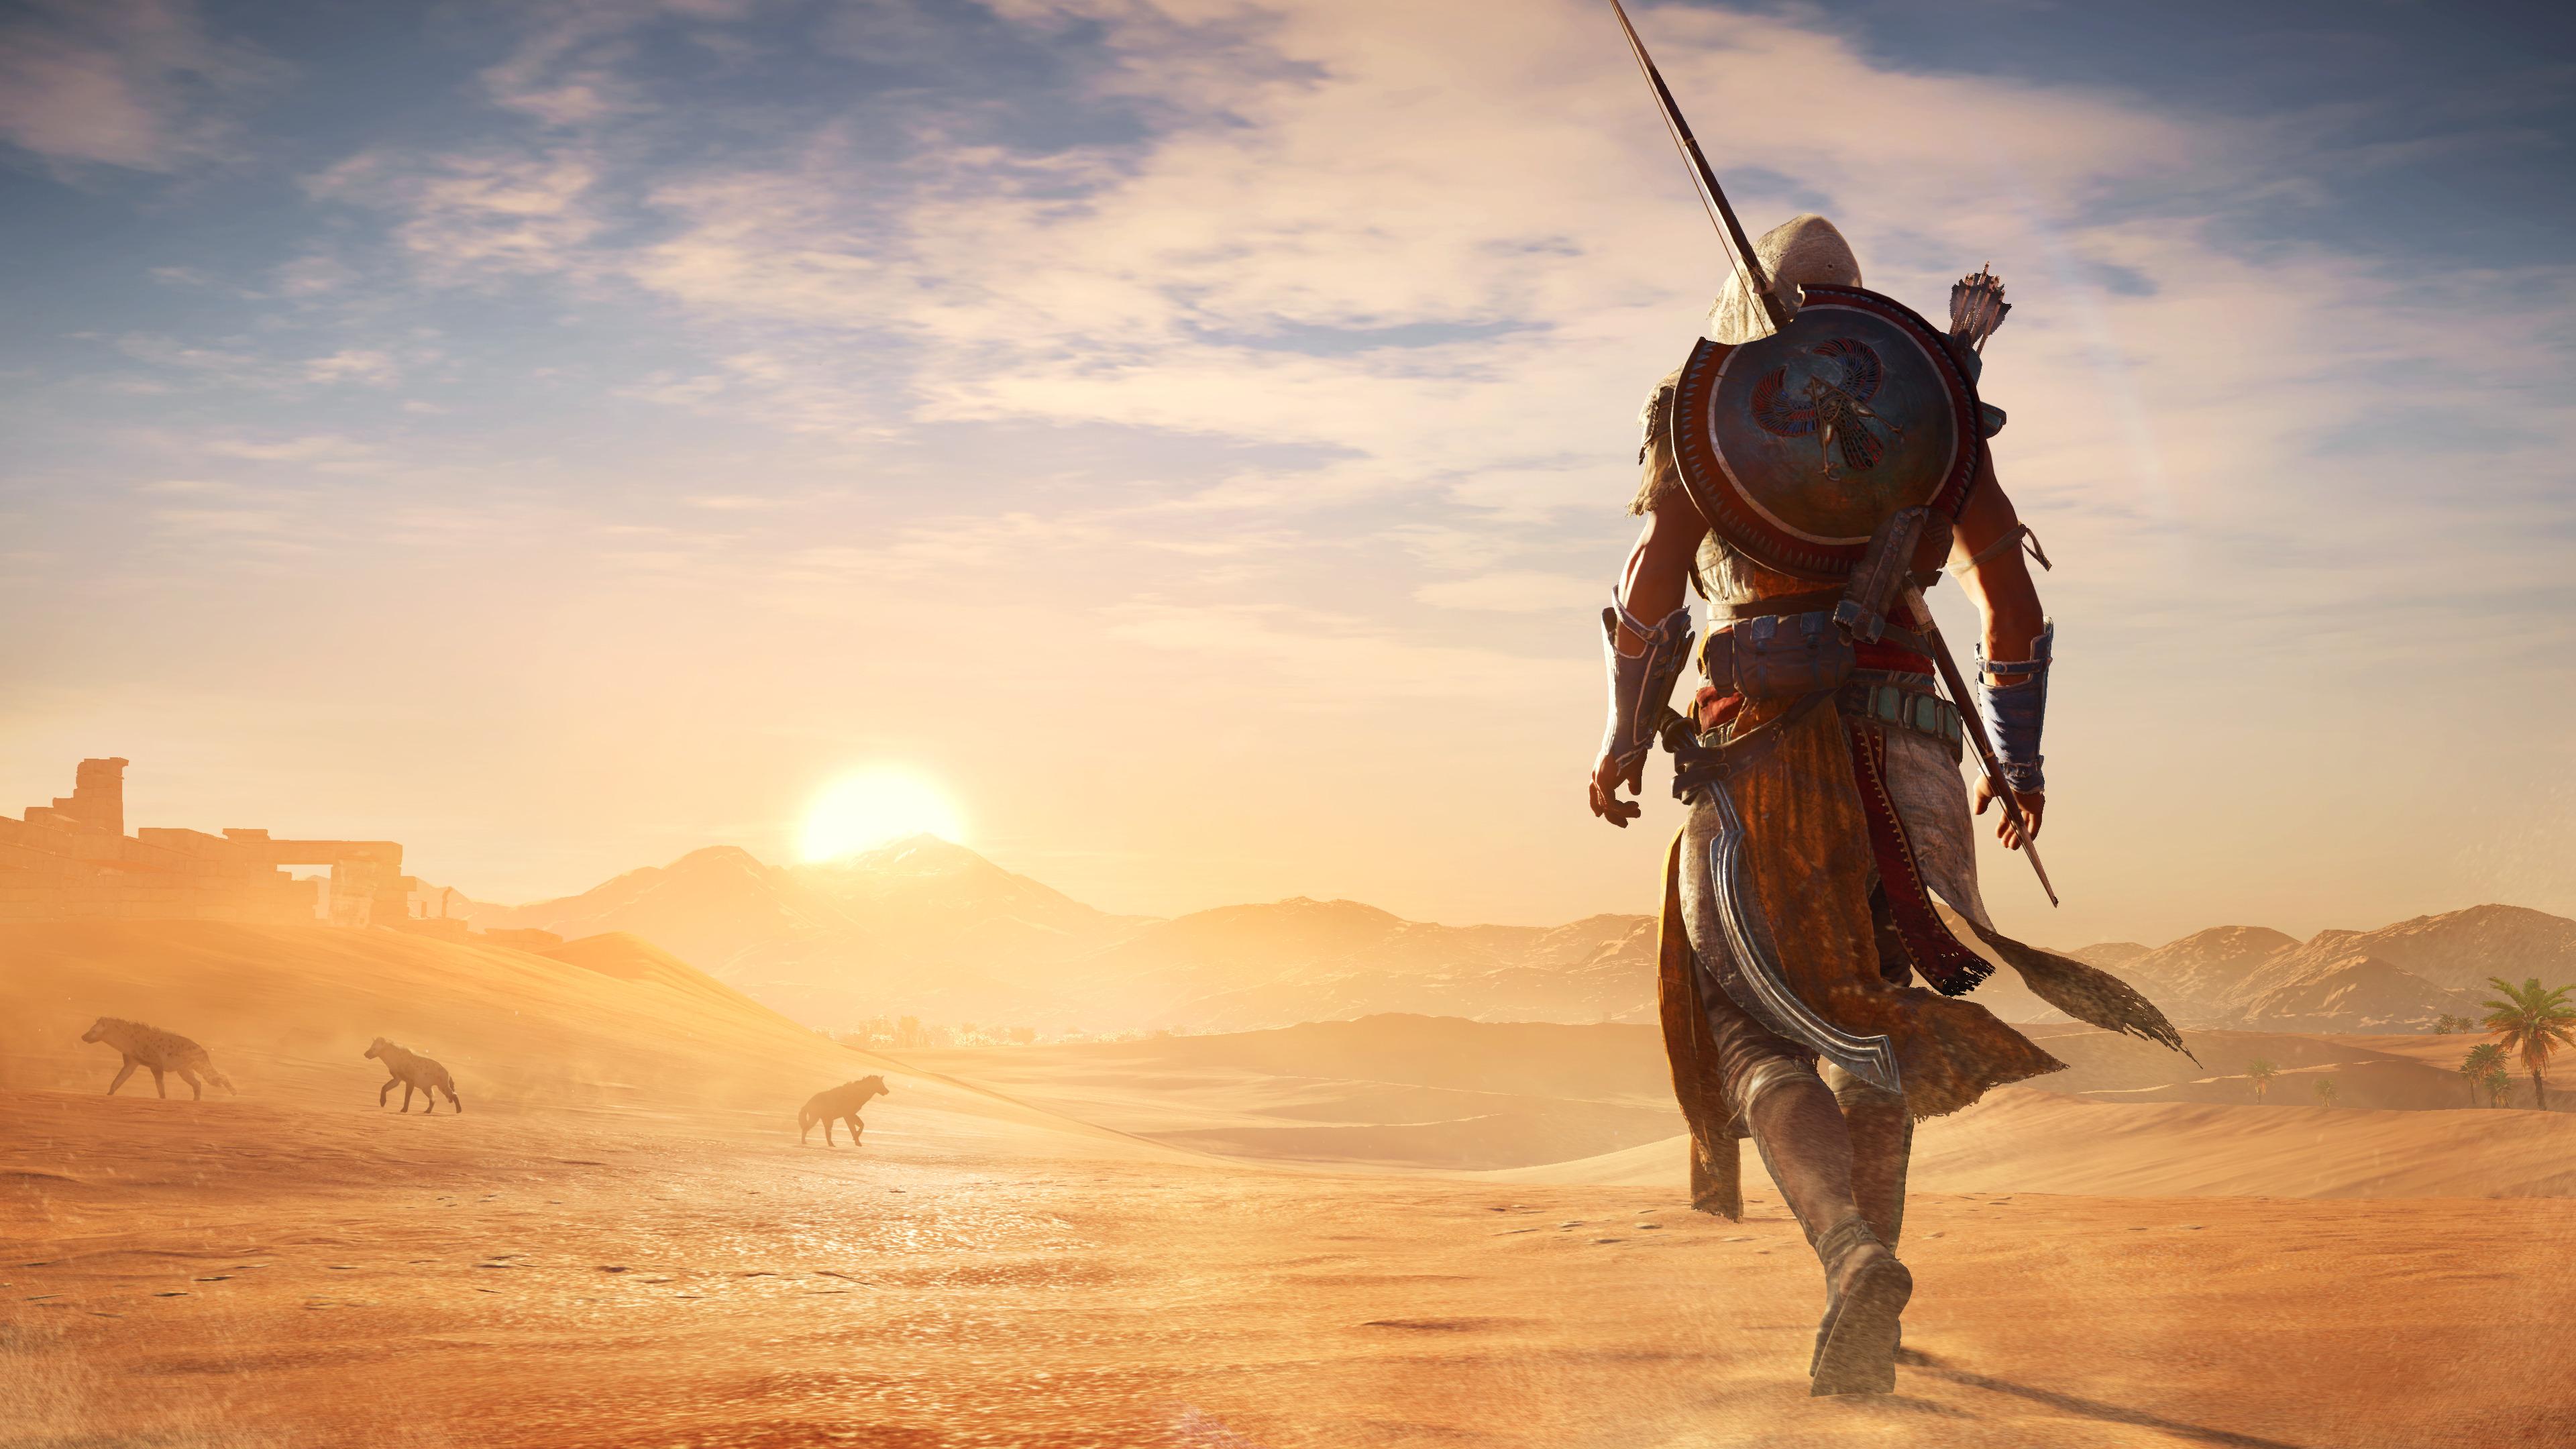 assassins creed origins, hd games, 4k wallpapers, images